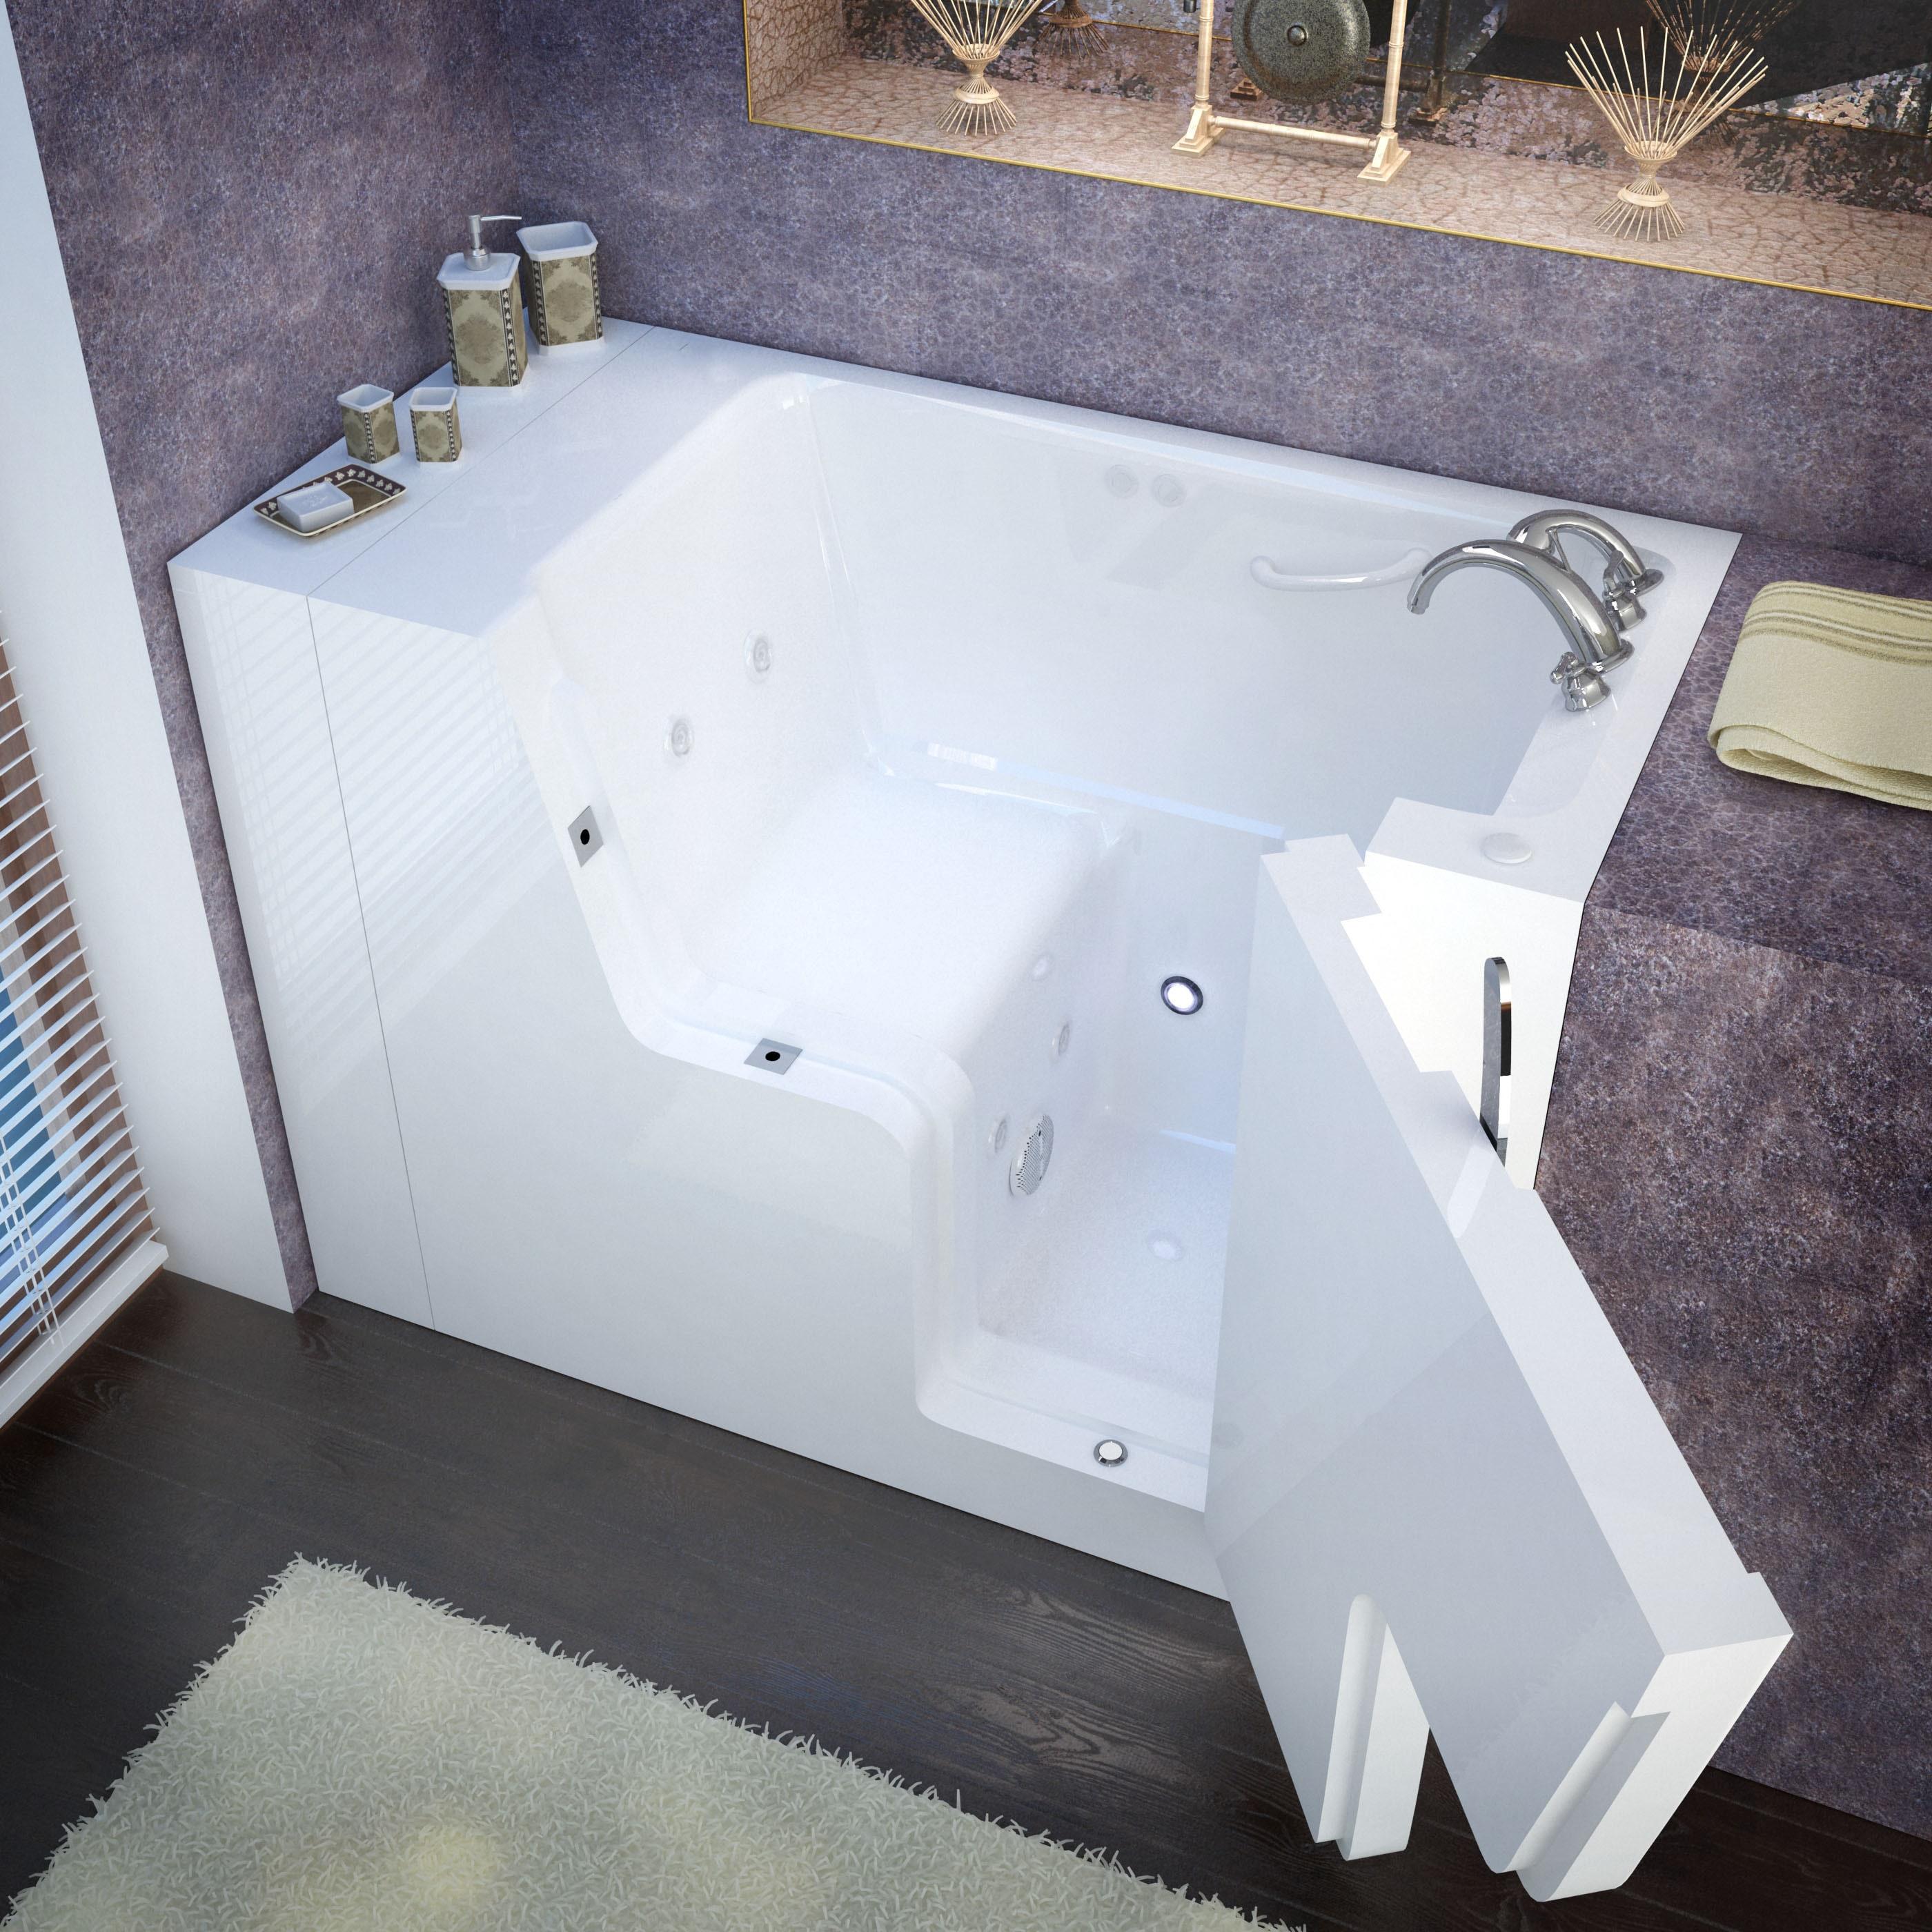 MediTub Wheelchair Accessible 29x53-inch Right Drain White Whirlpool ...